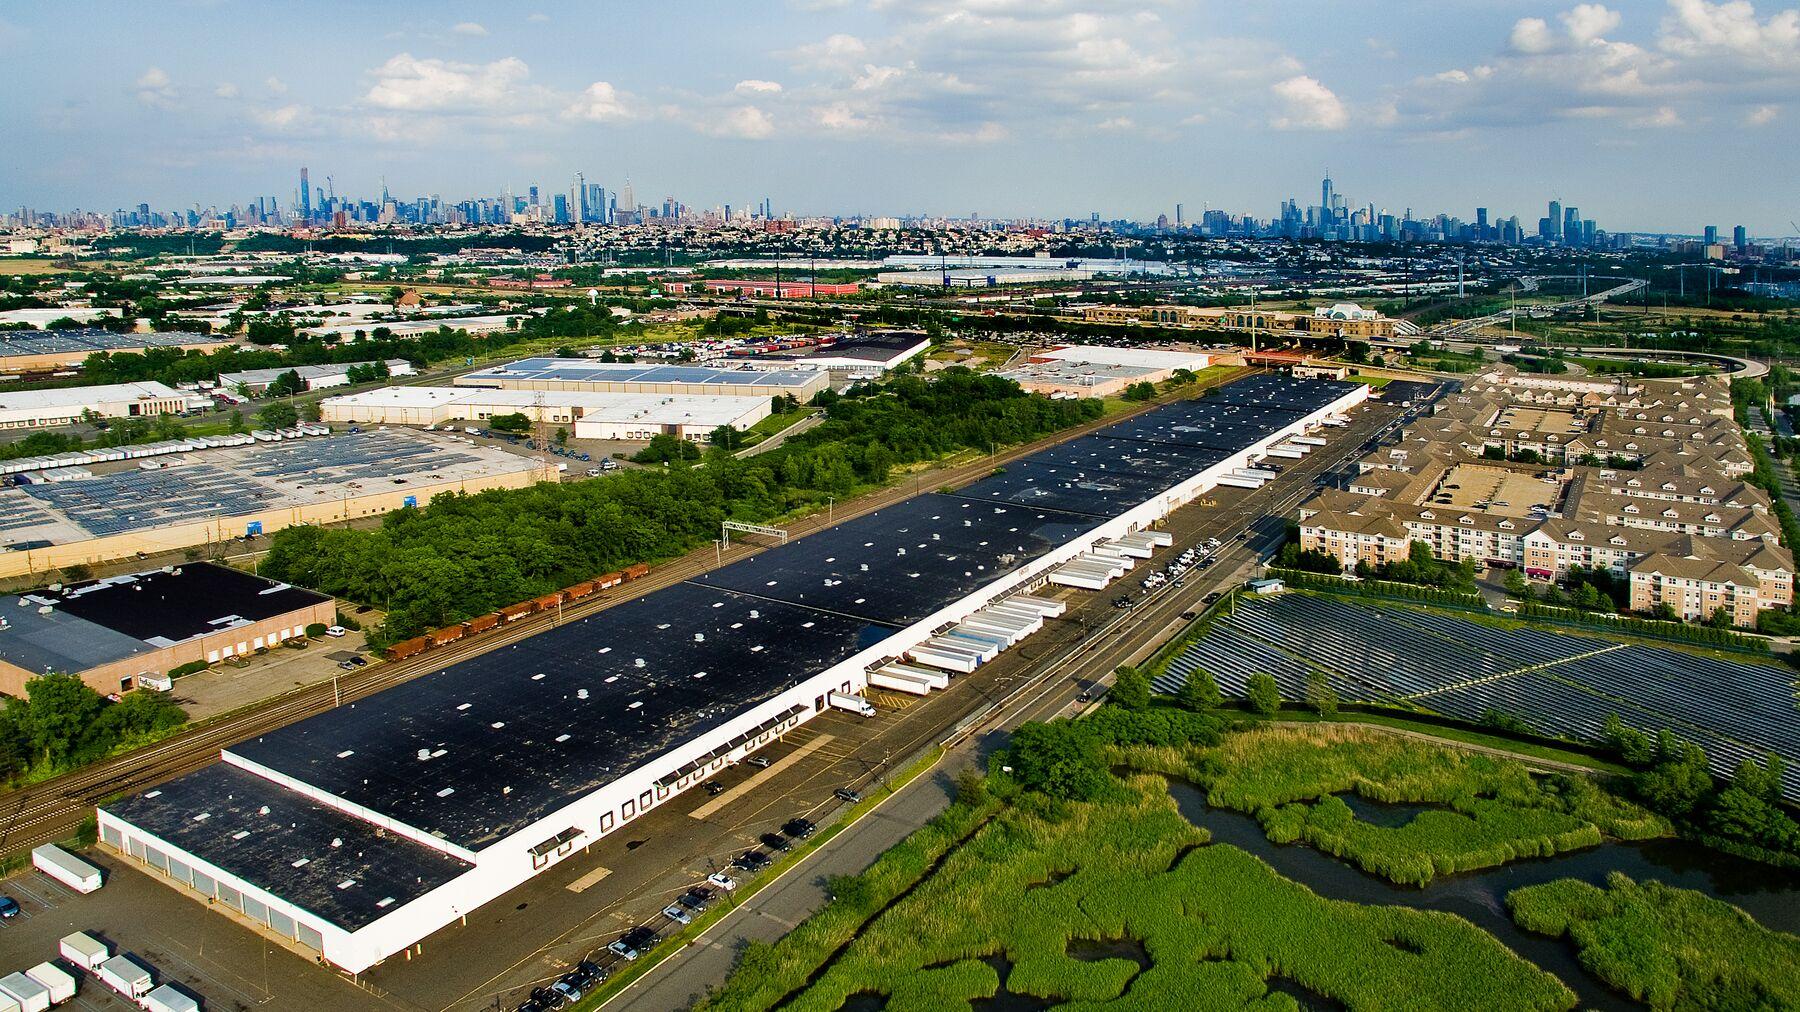 DPM-NNJ00101-1000-New-County-Road-Secaucus-NJ-aerial.jpg